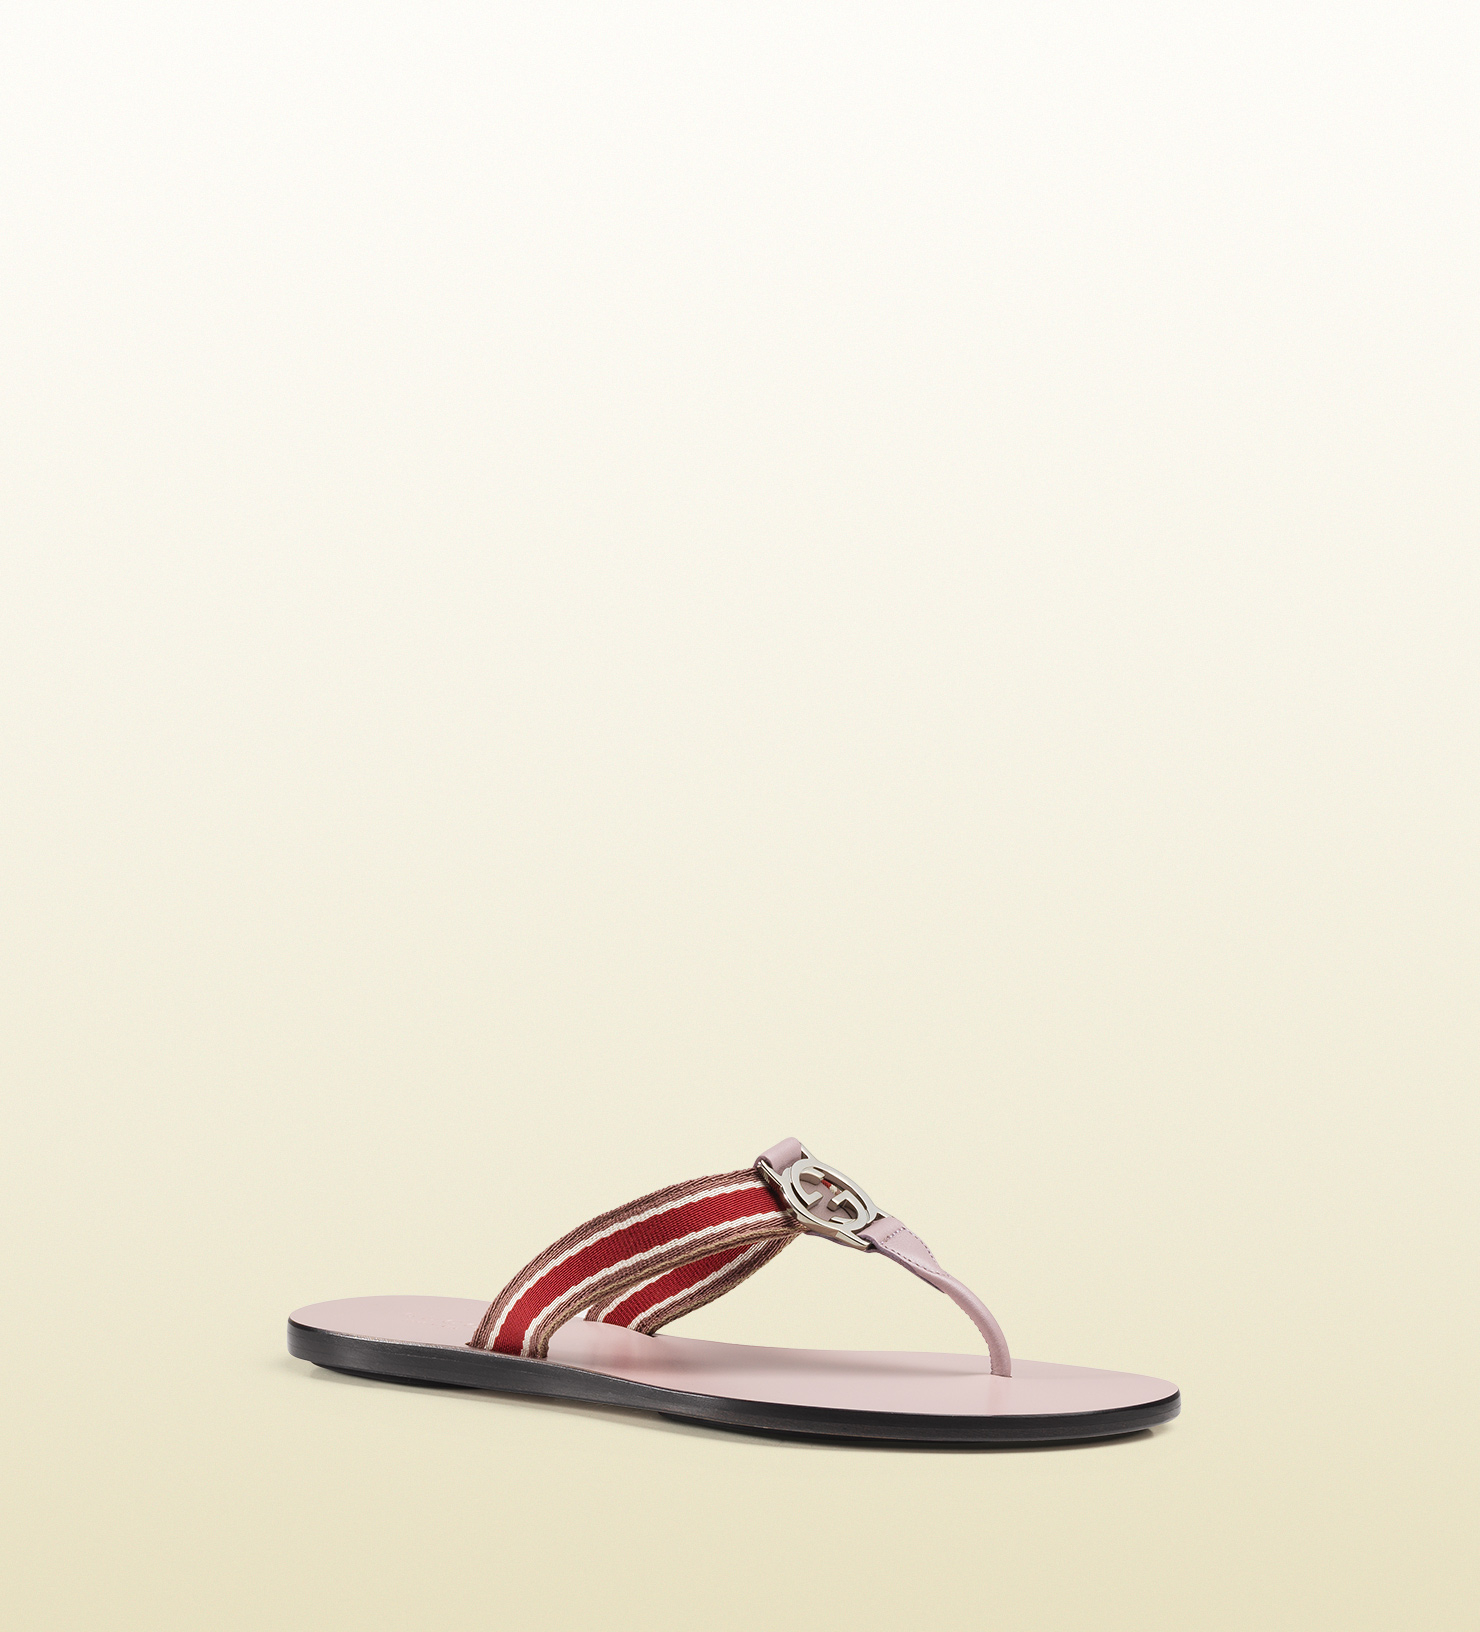 0859ffb74cf Lyst - Gucci Gg Thong Nylon Web Sandal in Red